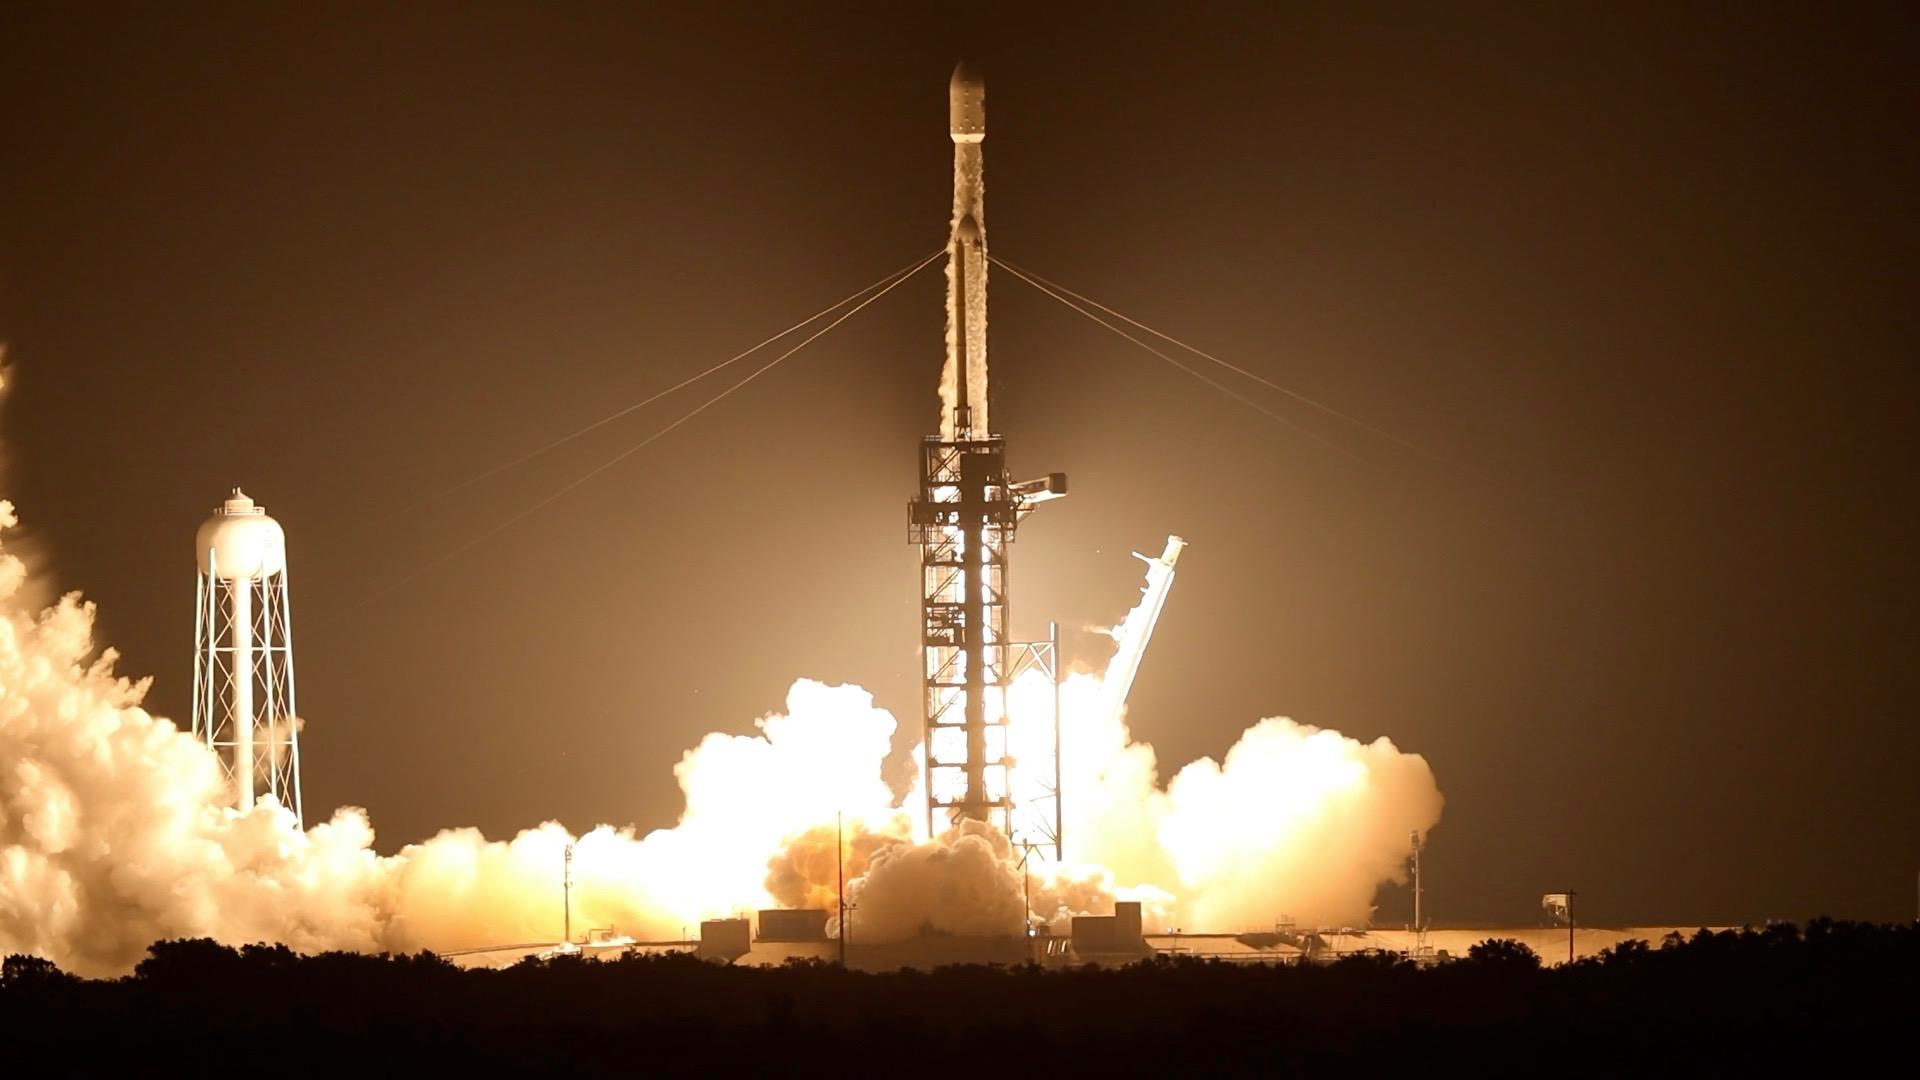 STP-2 SpaceX Falcon Heavy Launch  Image courtesy of Peter Van Delden